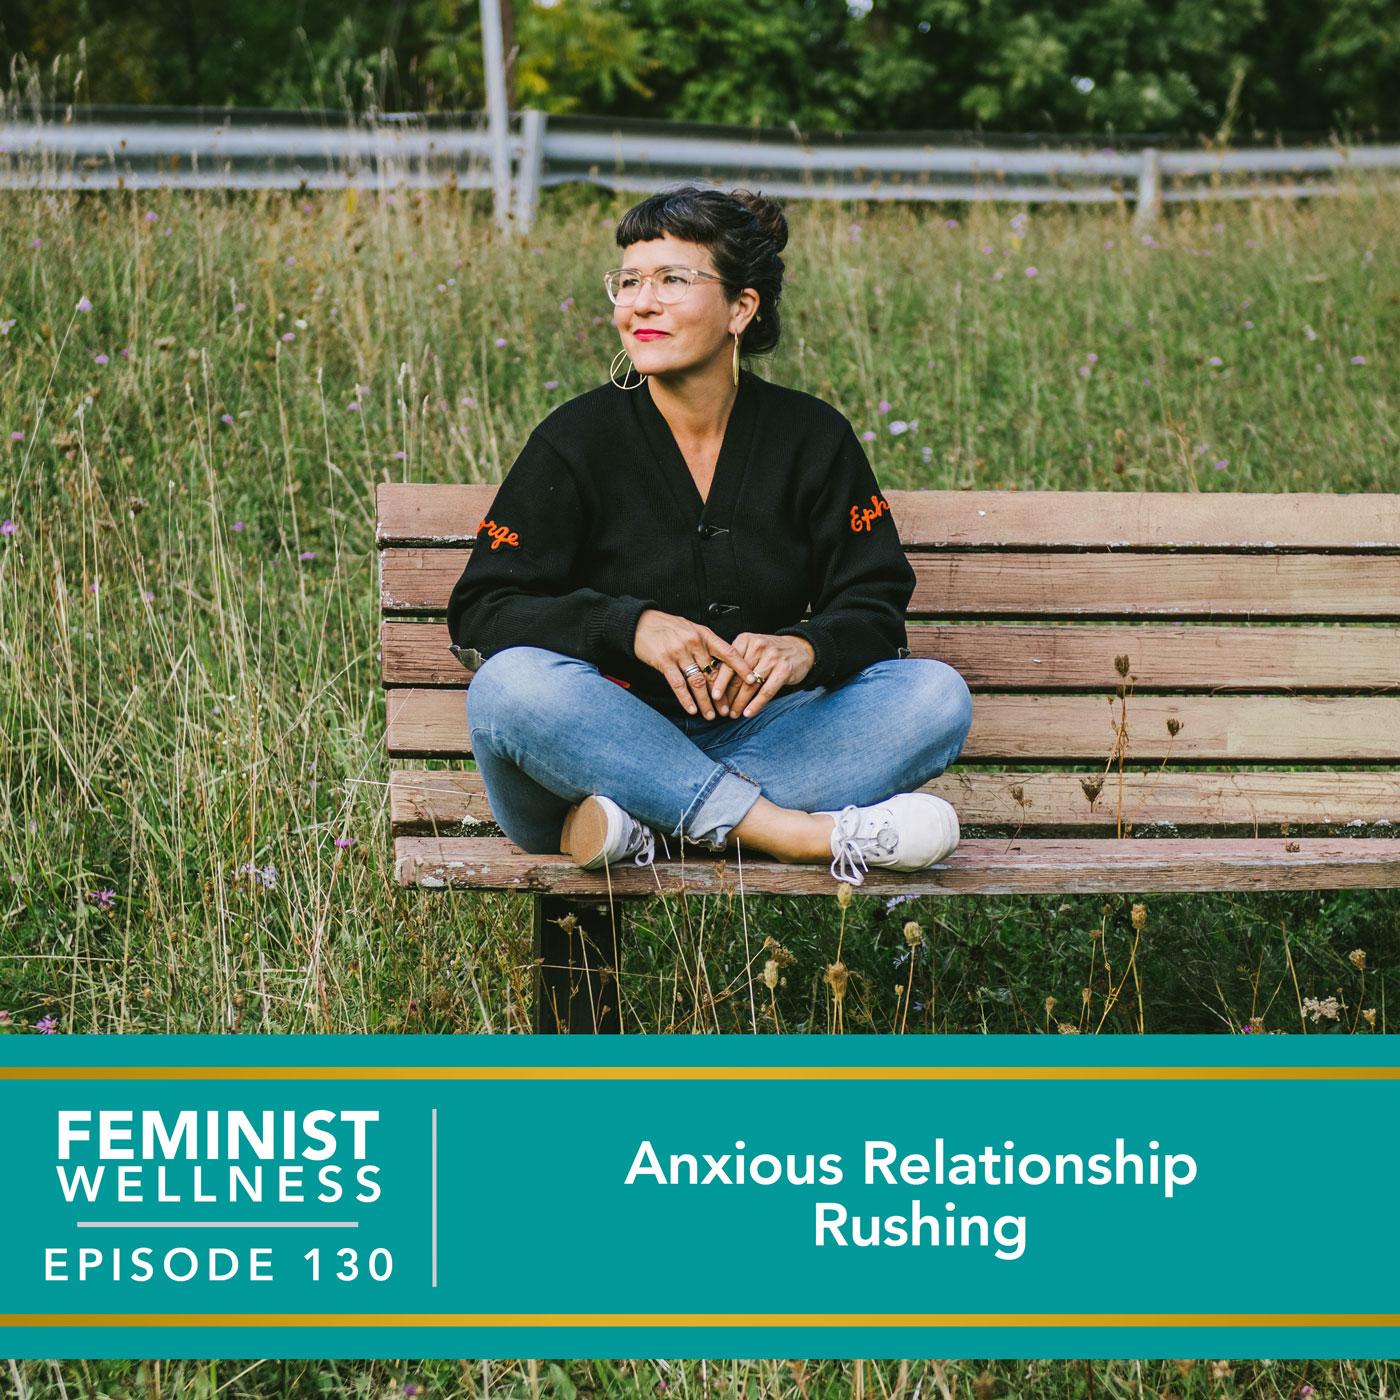 Feminist Wellness with Victoria Albina   Anxious Relationship Rushing